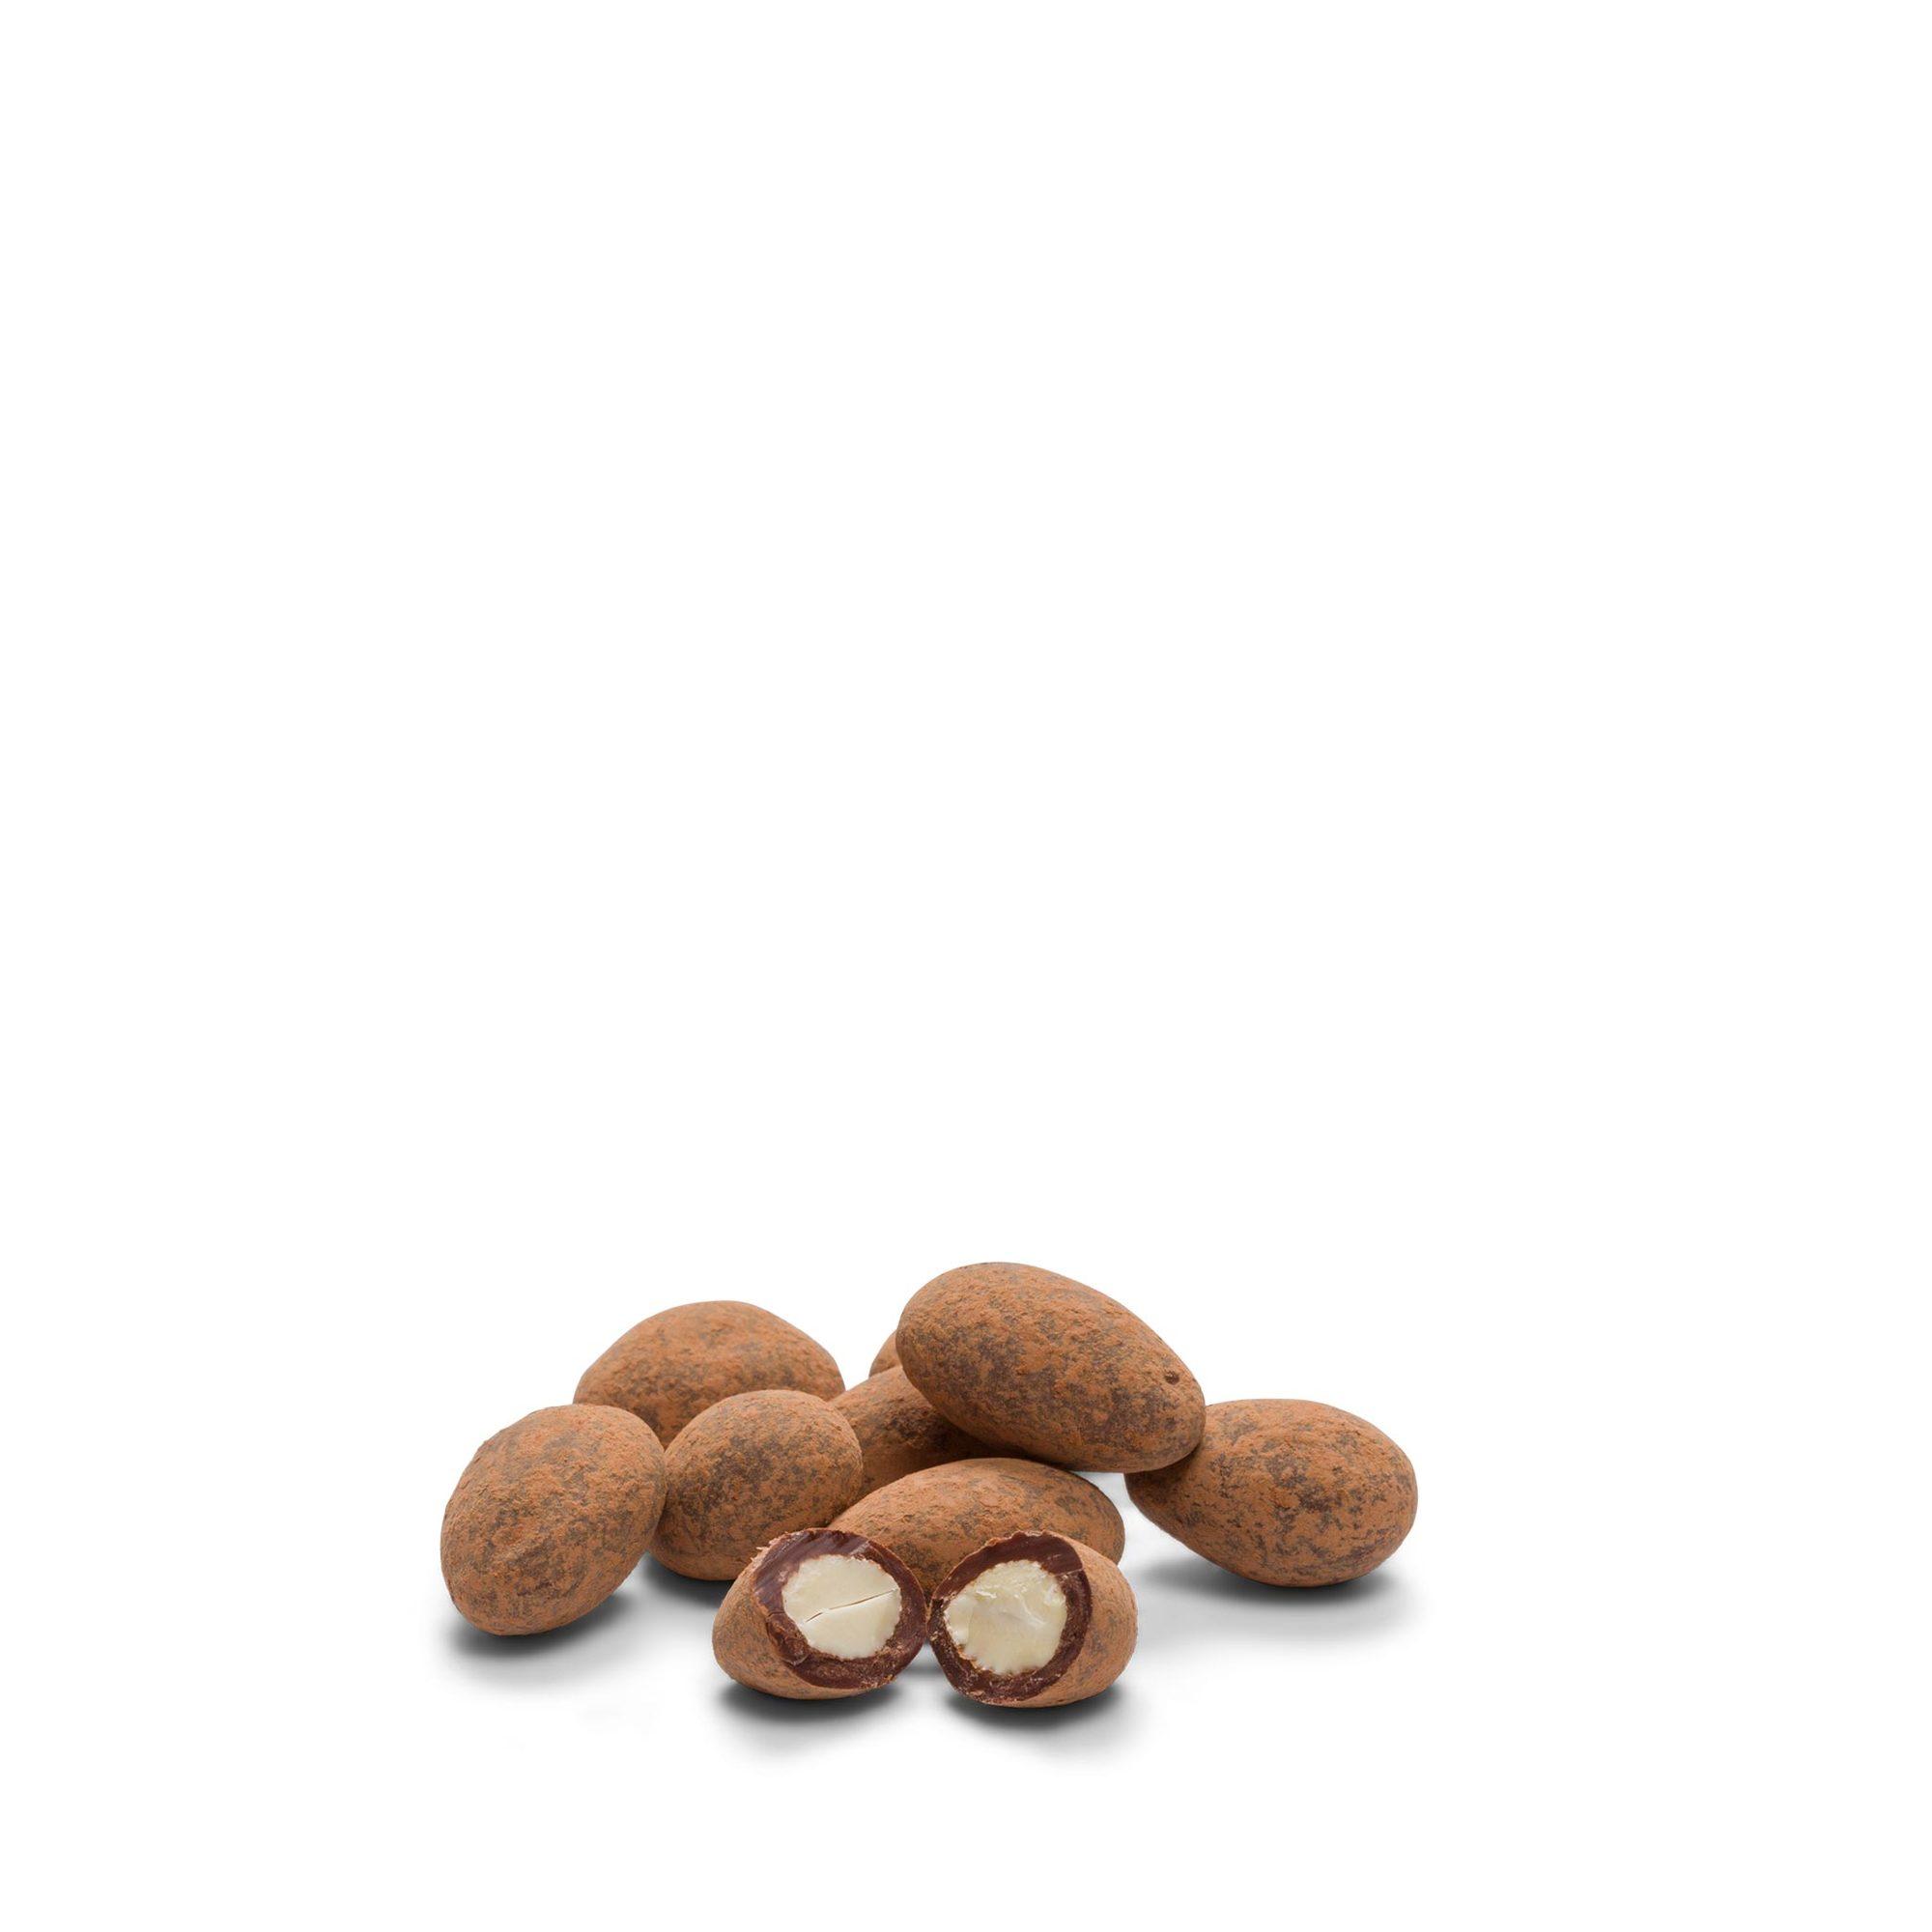 Raw Chocolate Almonds | Raw Chocolate Company